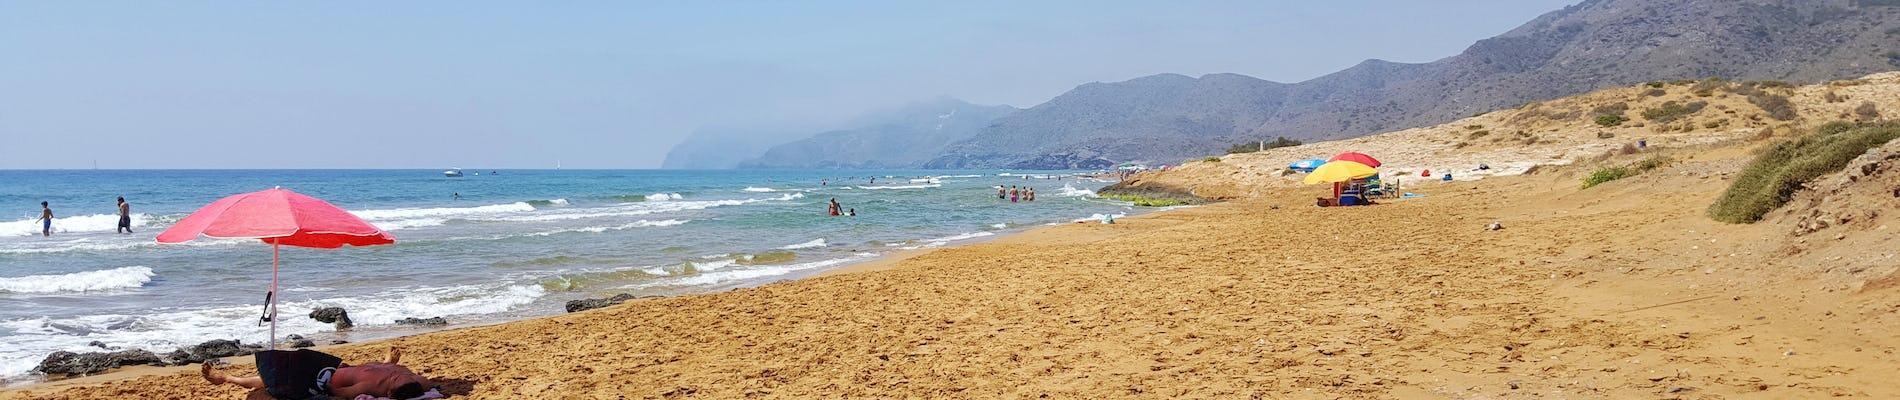 Murcia - Where are the nicest beaches?